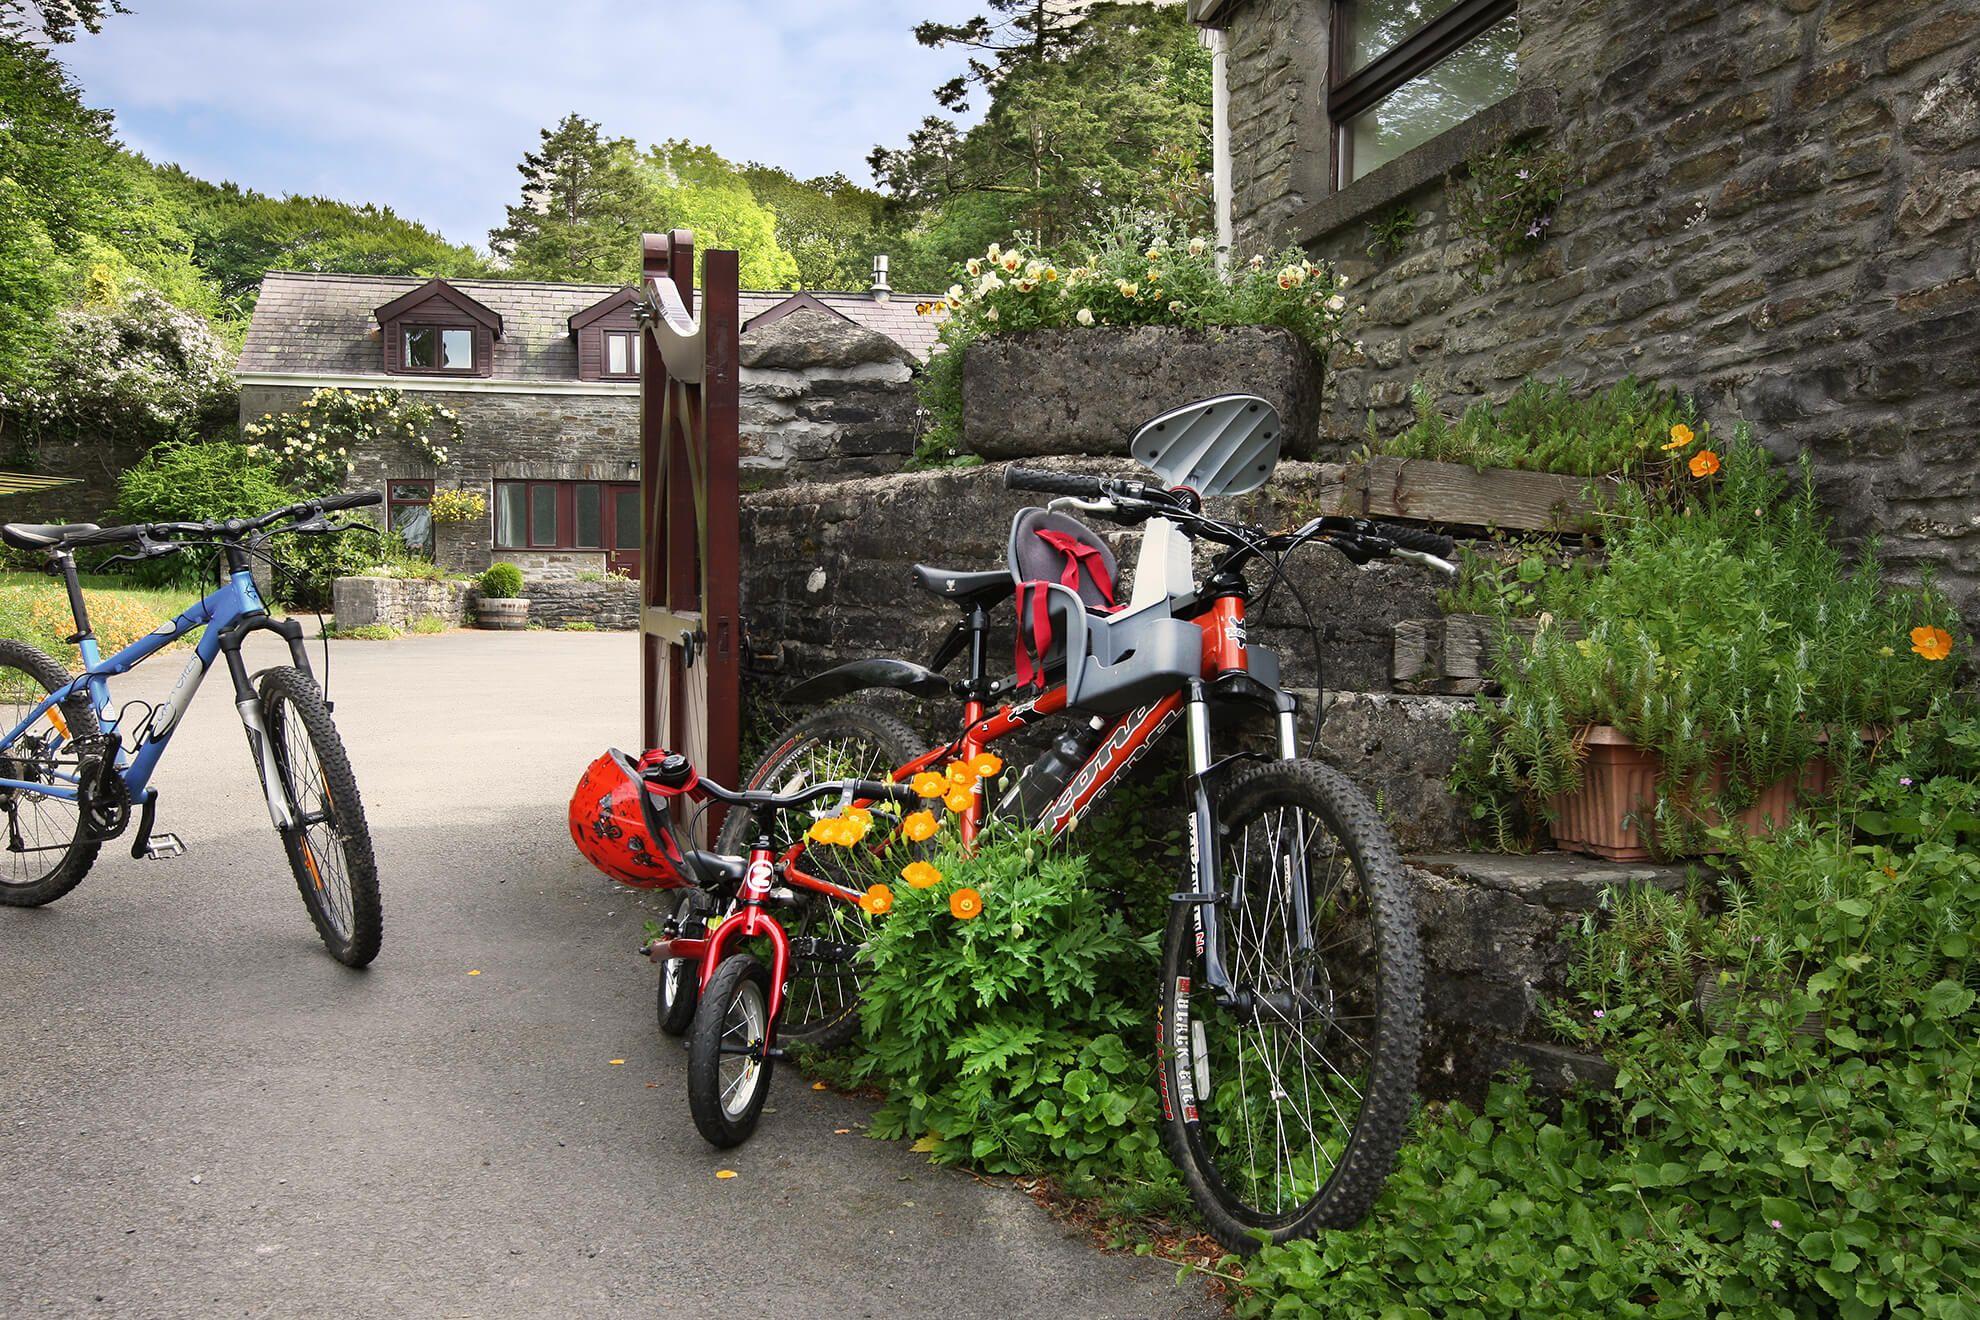 Bikes on the courtyard at Hafod Y Wennol